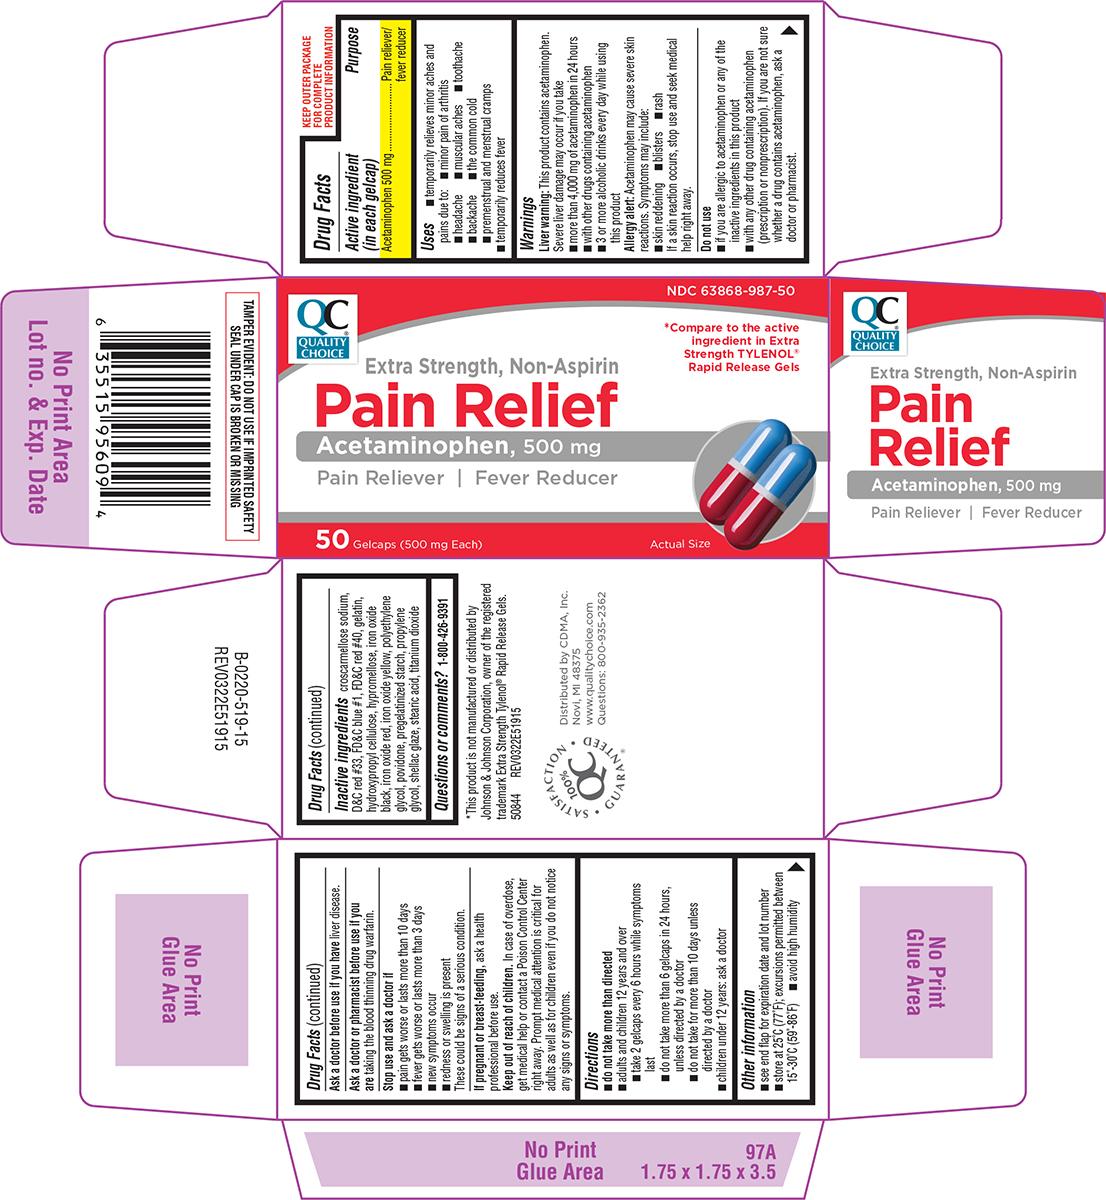 Extra Strength Non-aspirin (Acetaminophen) Capsule, Gelatin Coated [Chain Drug Marketing Association Inc]